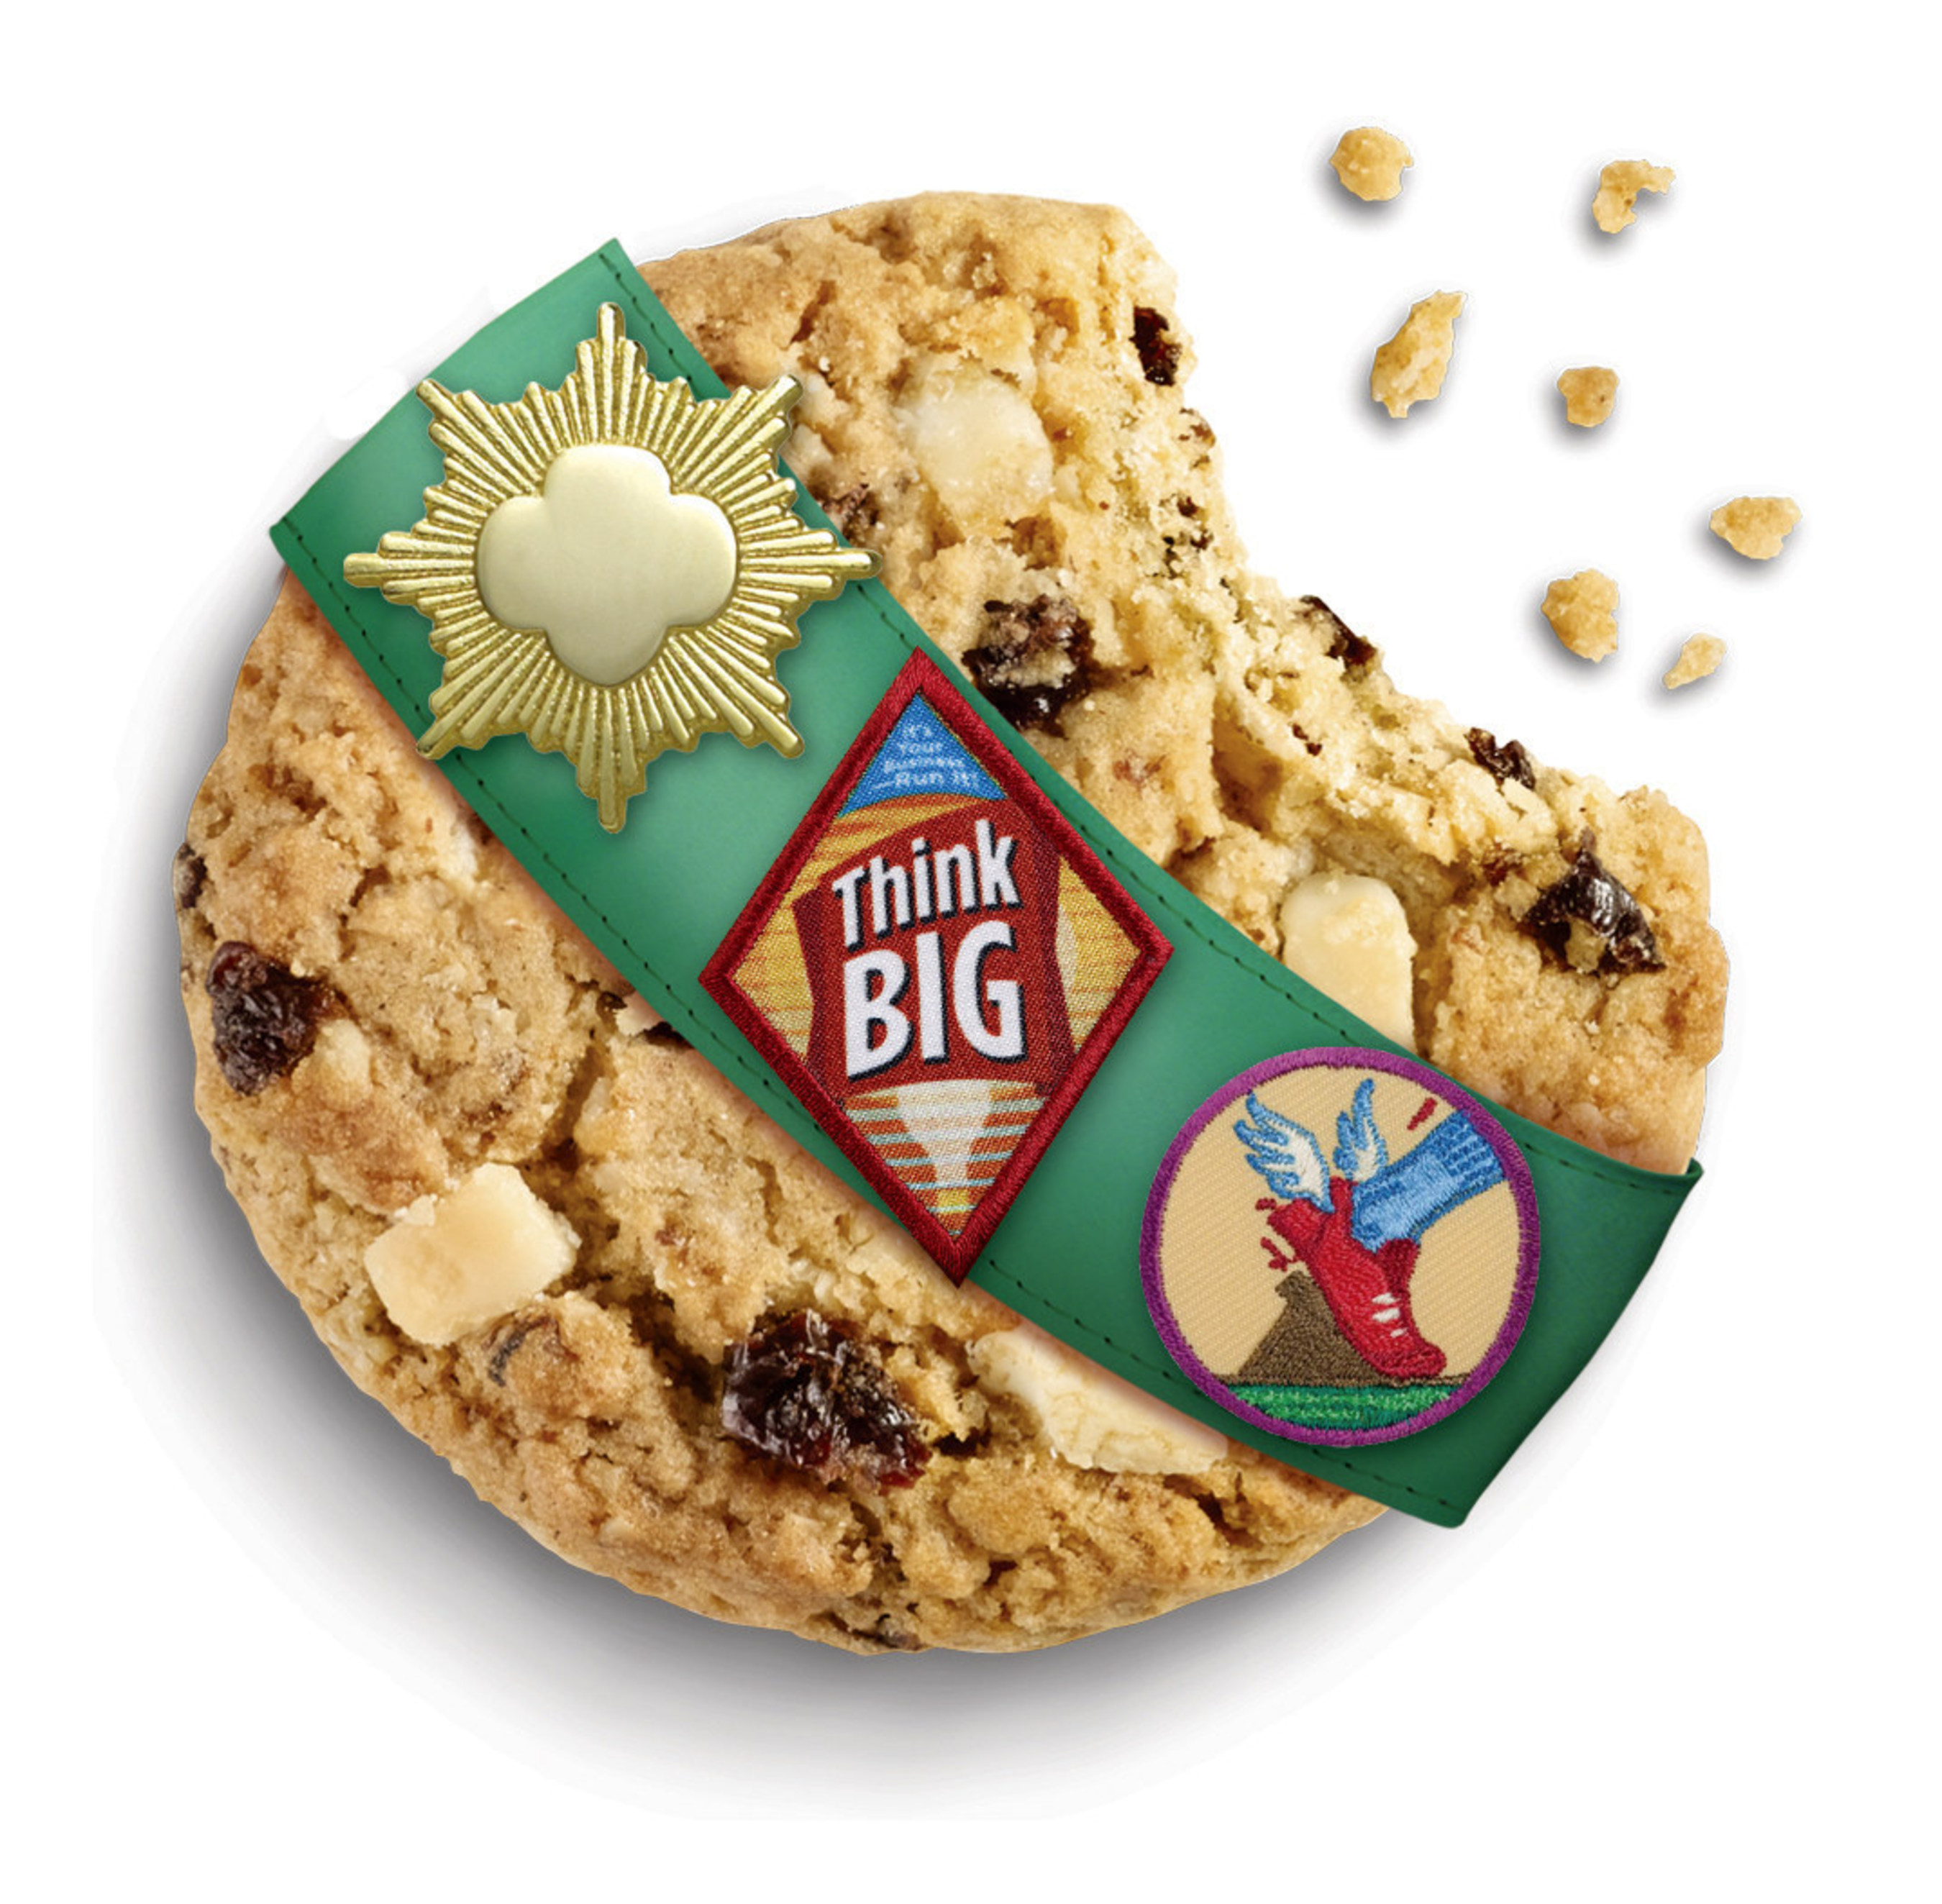 Rah-Rah Raisins are oatmeal raisin cookies with whole grain oats, plump, juicy raisins, and Greek yogurt-flavored chunks.